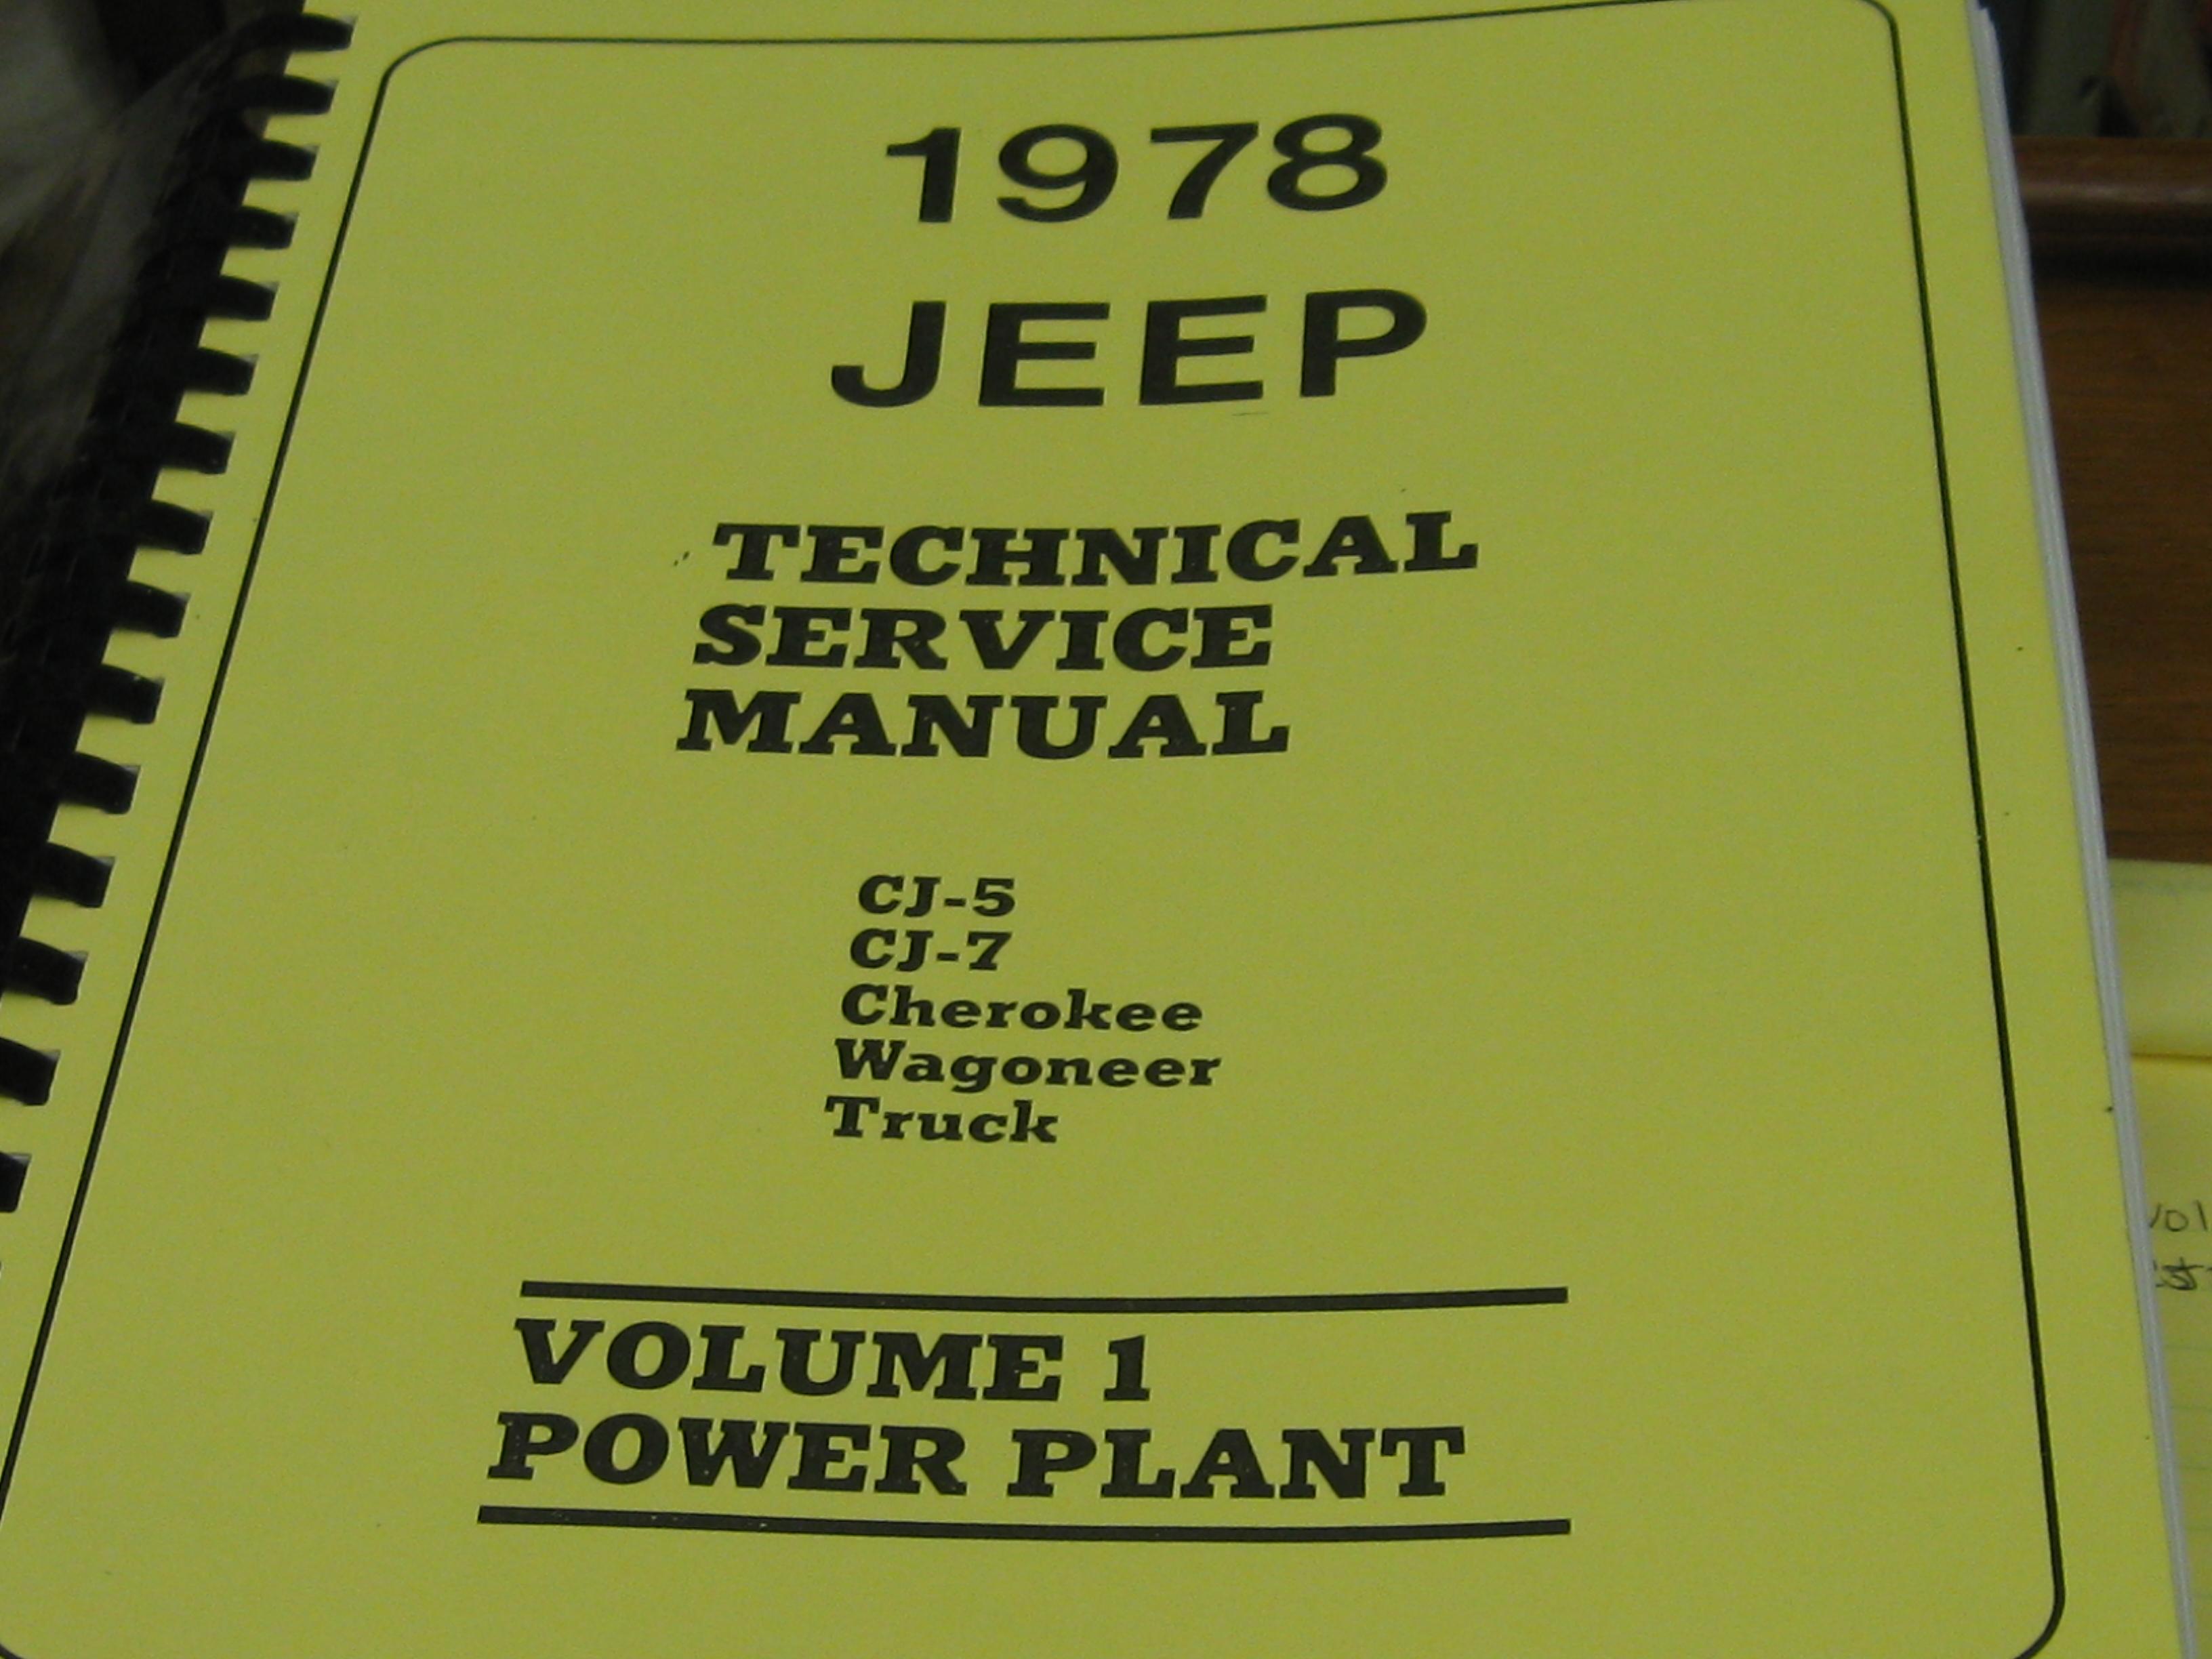 1982 jeep shop manual cj5 cj7 cj8 cherokee wagoneer truck.